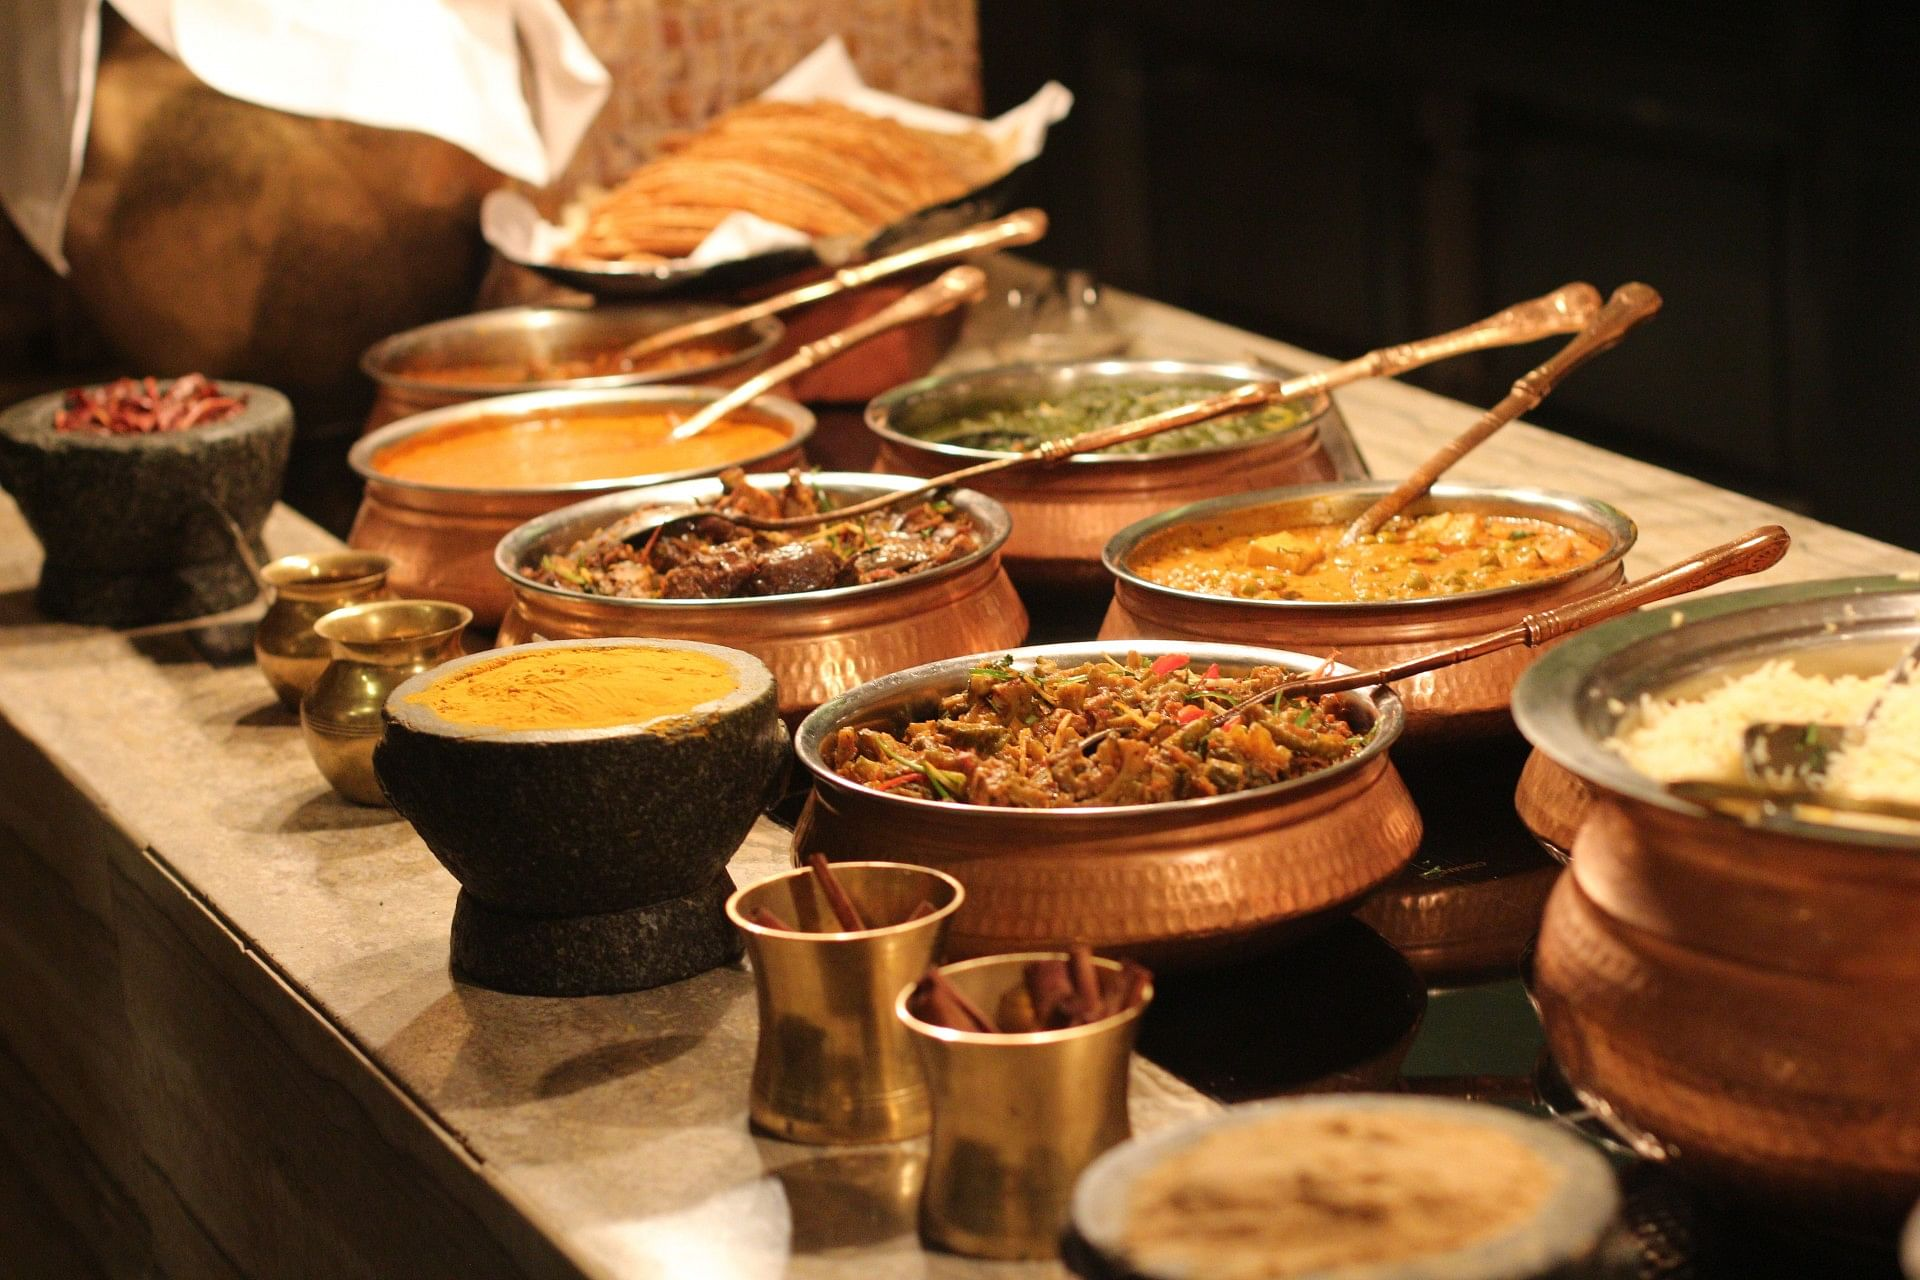 GST- restaurant - overcharge - complain